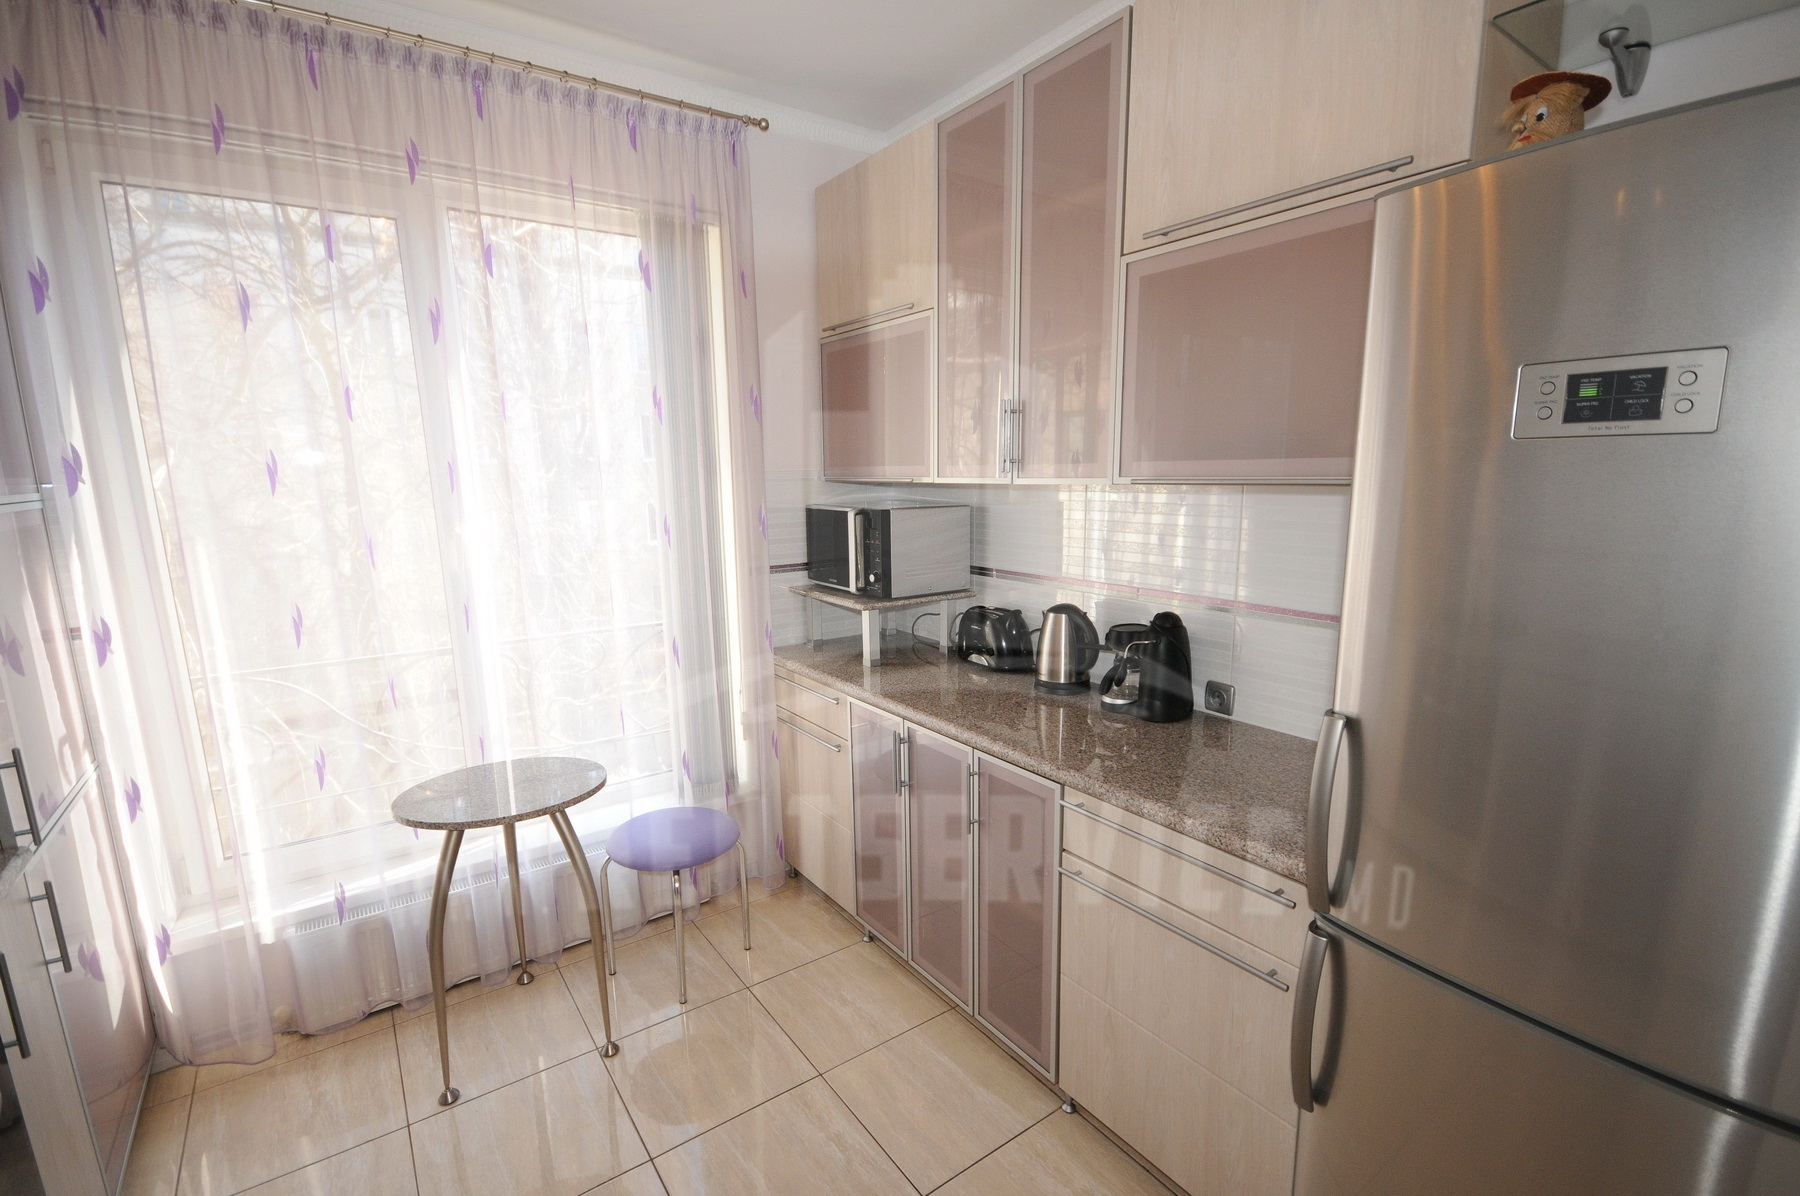 210_apartment_7.JPG